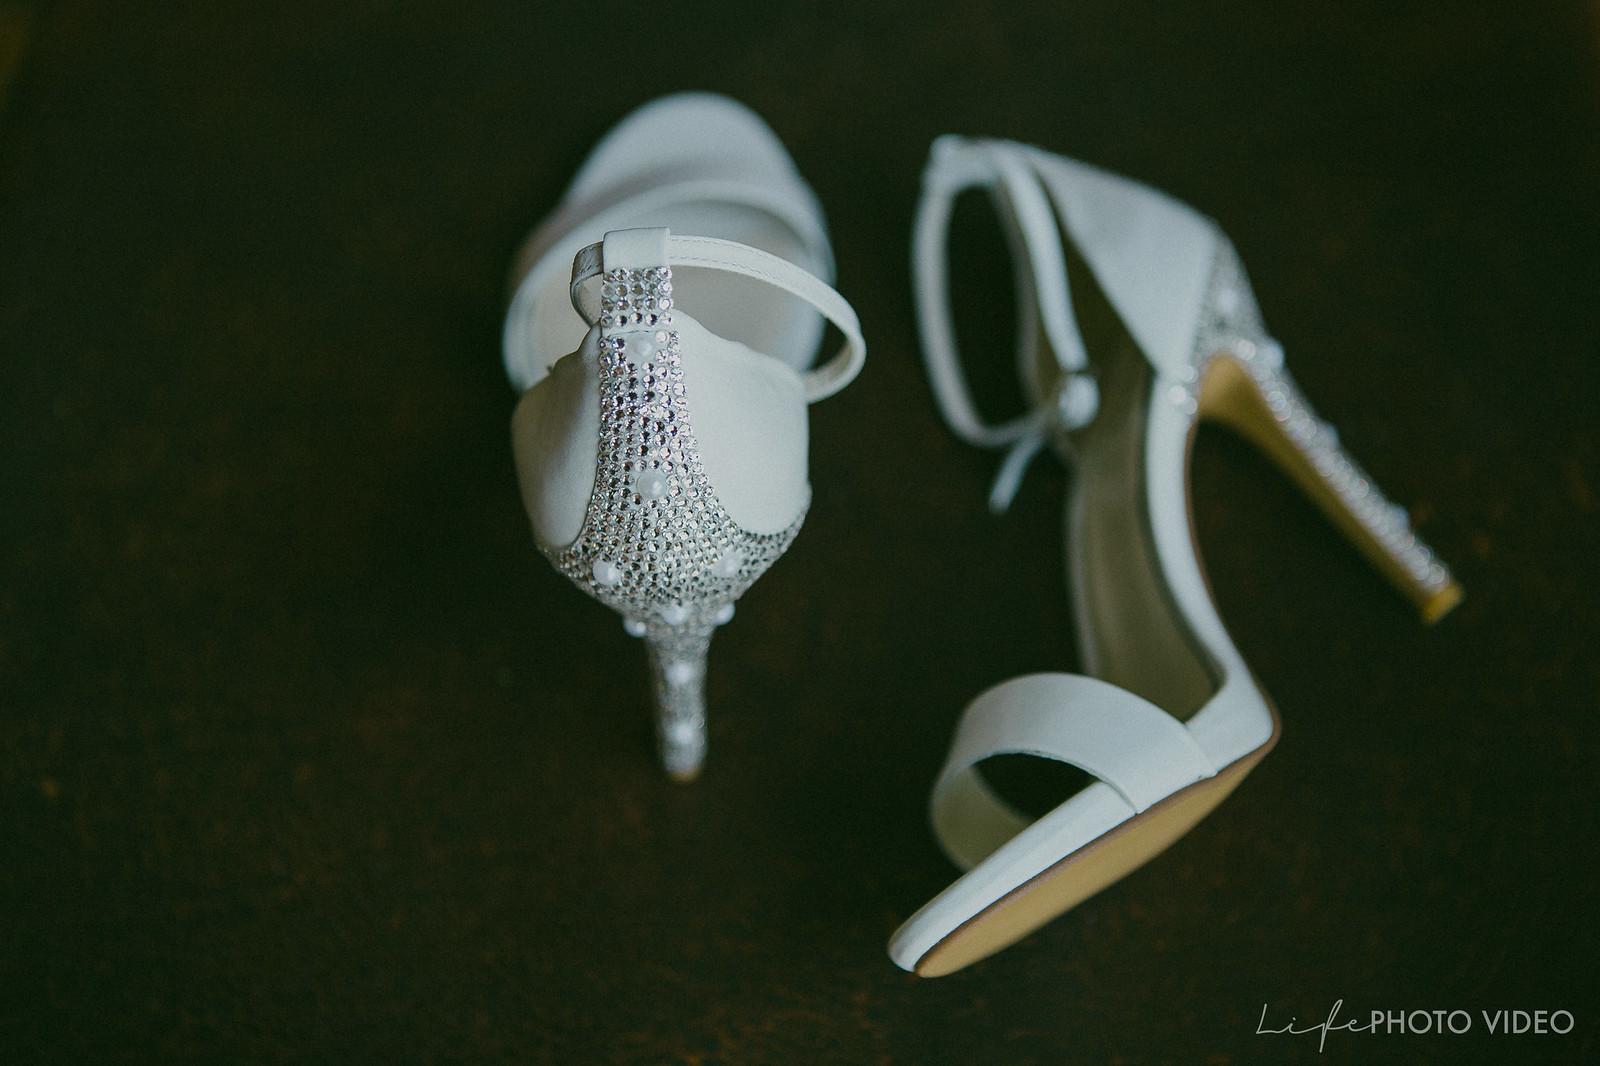 LifePhotoVideo_Boda_Guanajuato_Wedding_0010